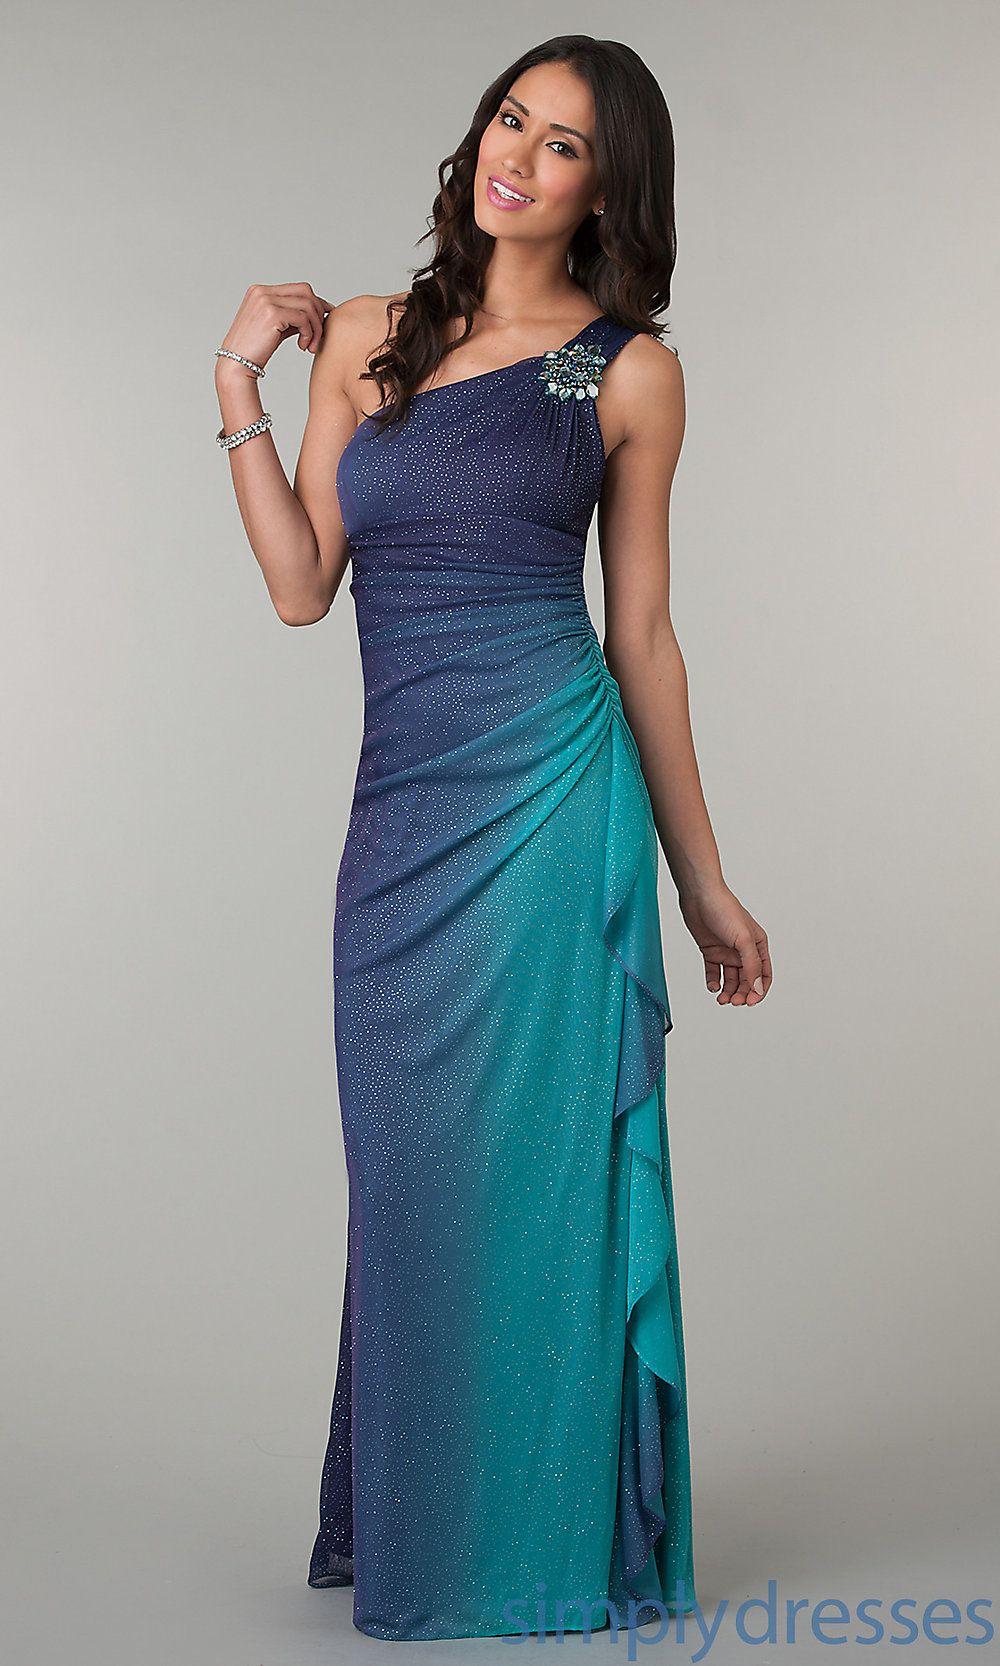 sunset Prom Dress | One Shoulder Floor Length Ombre Glitter Dress ...